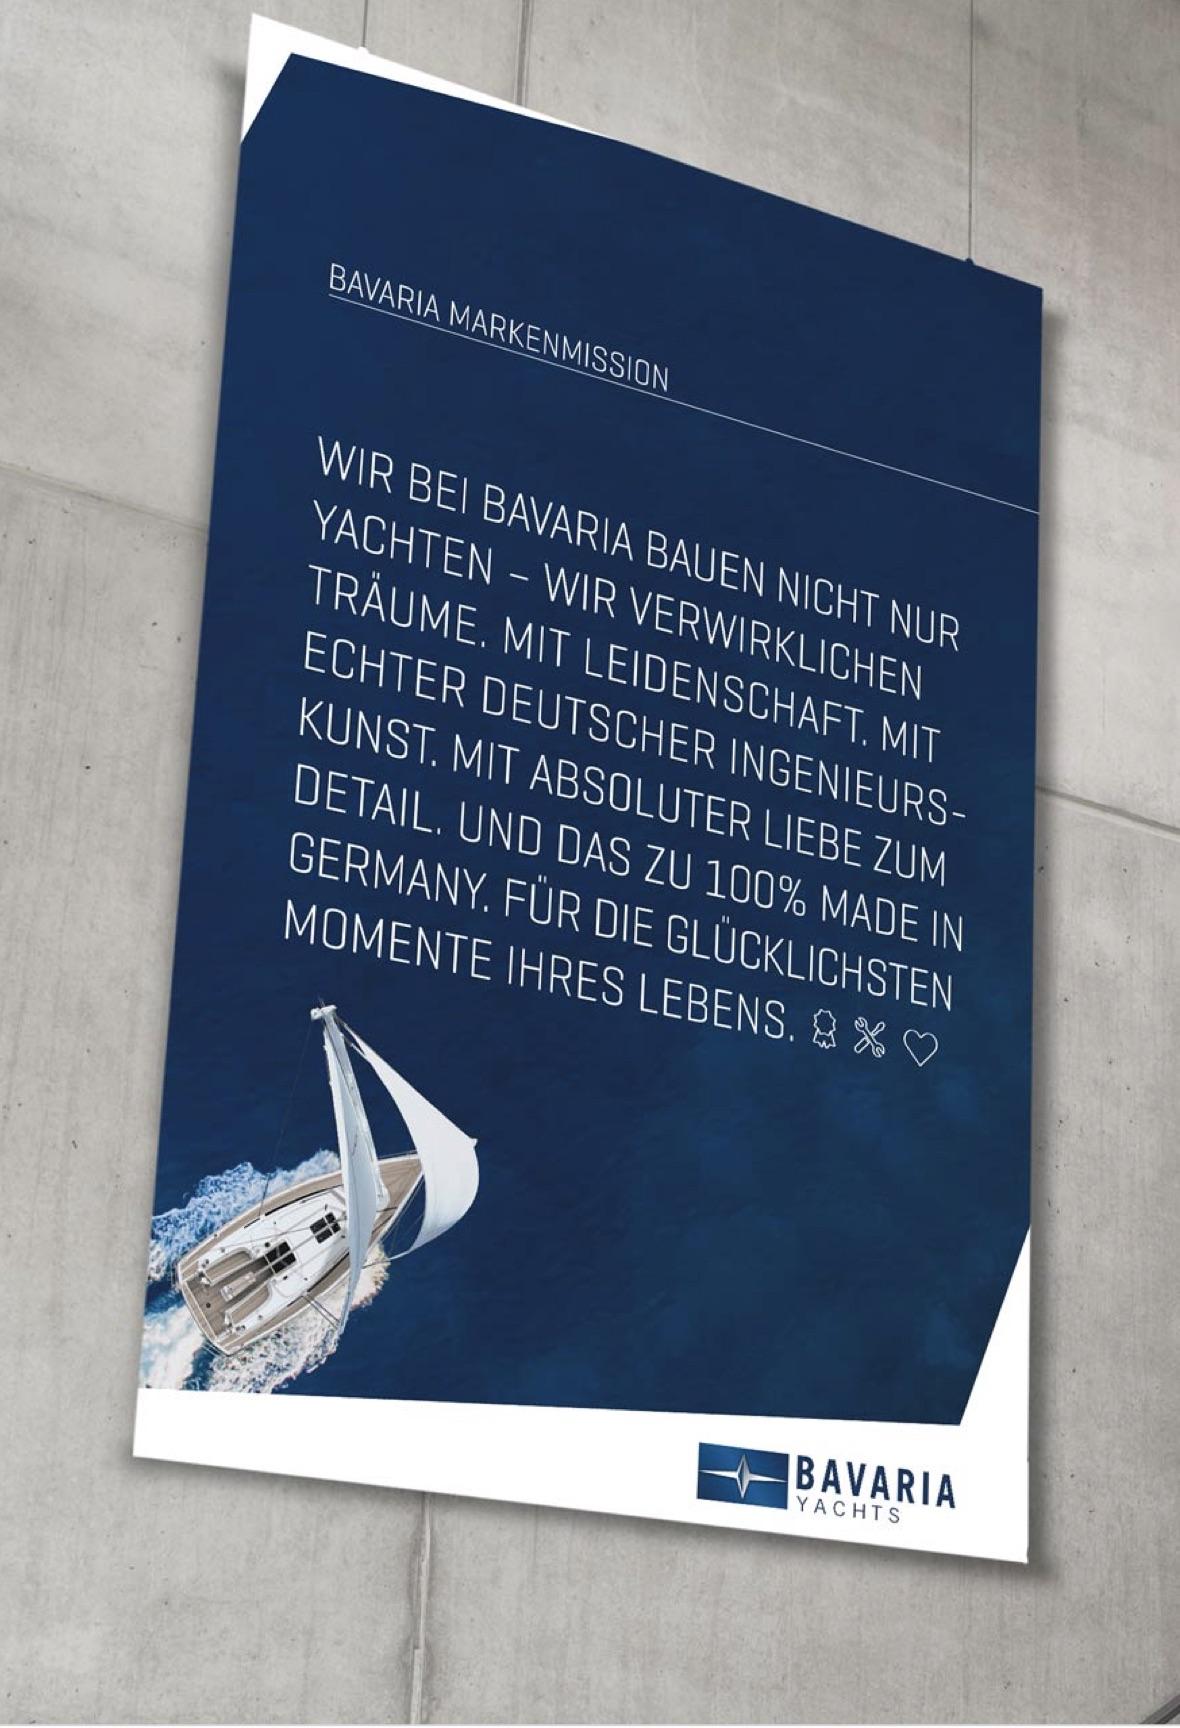 Bavaria Yachts – Markenmission (Mission Statement)